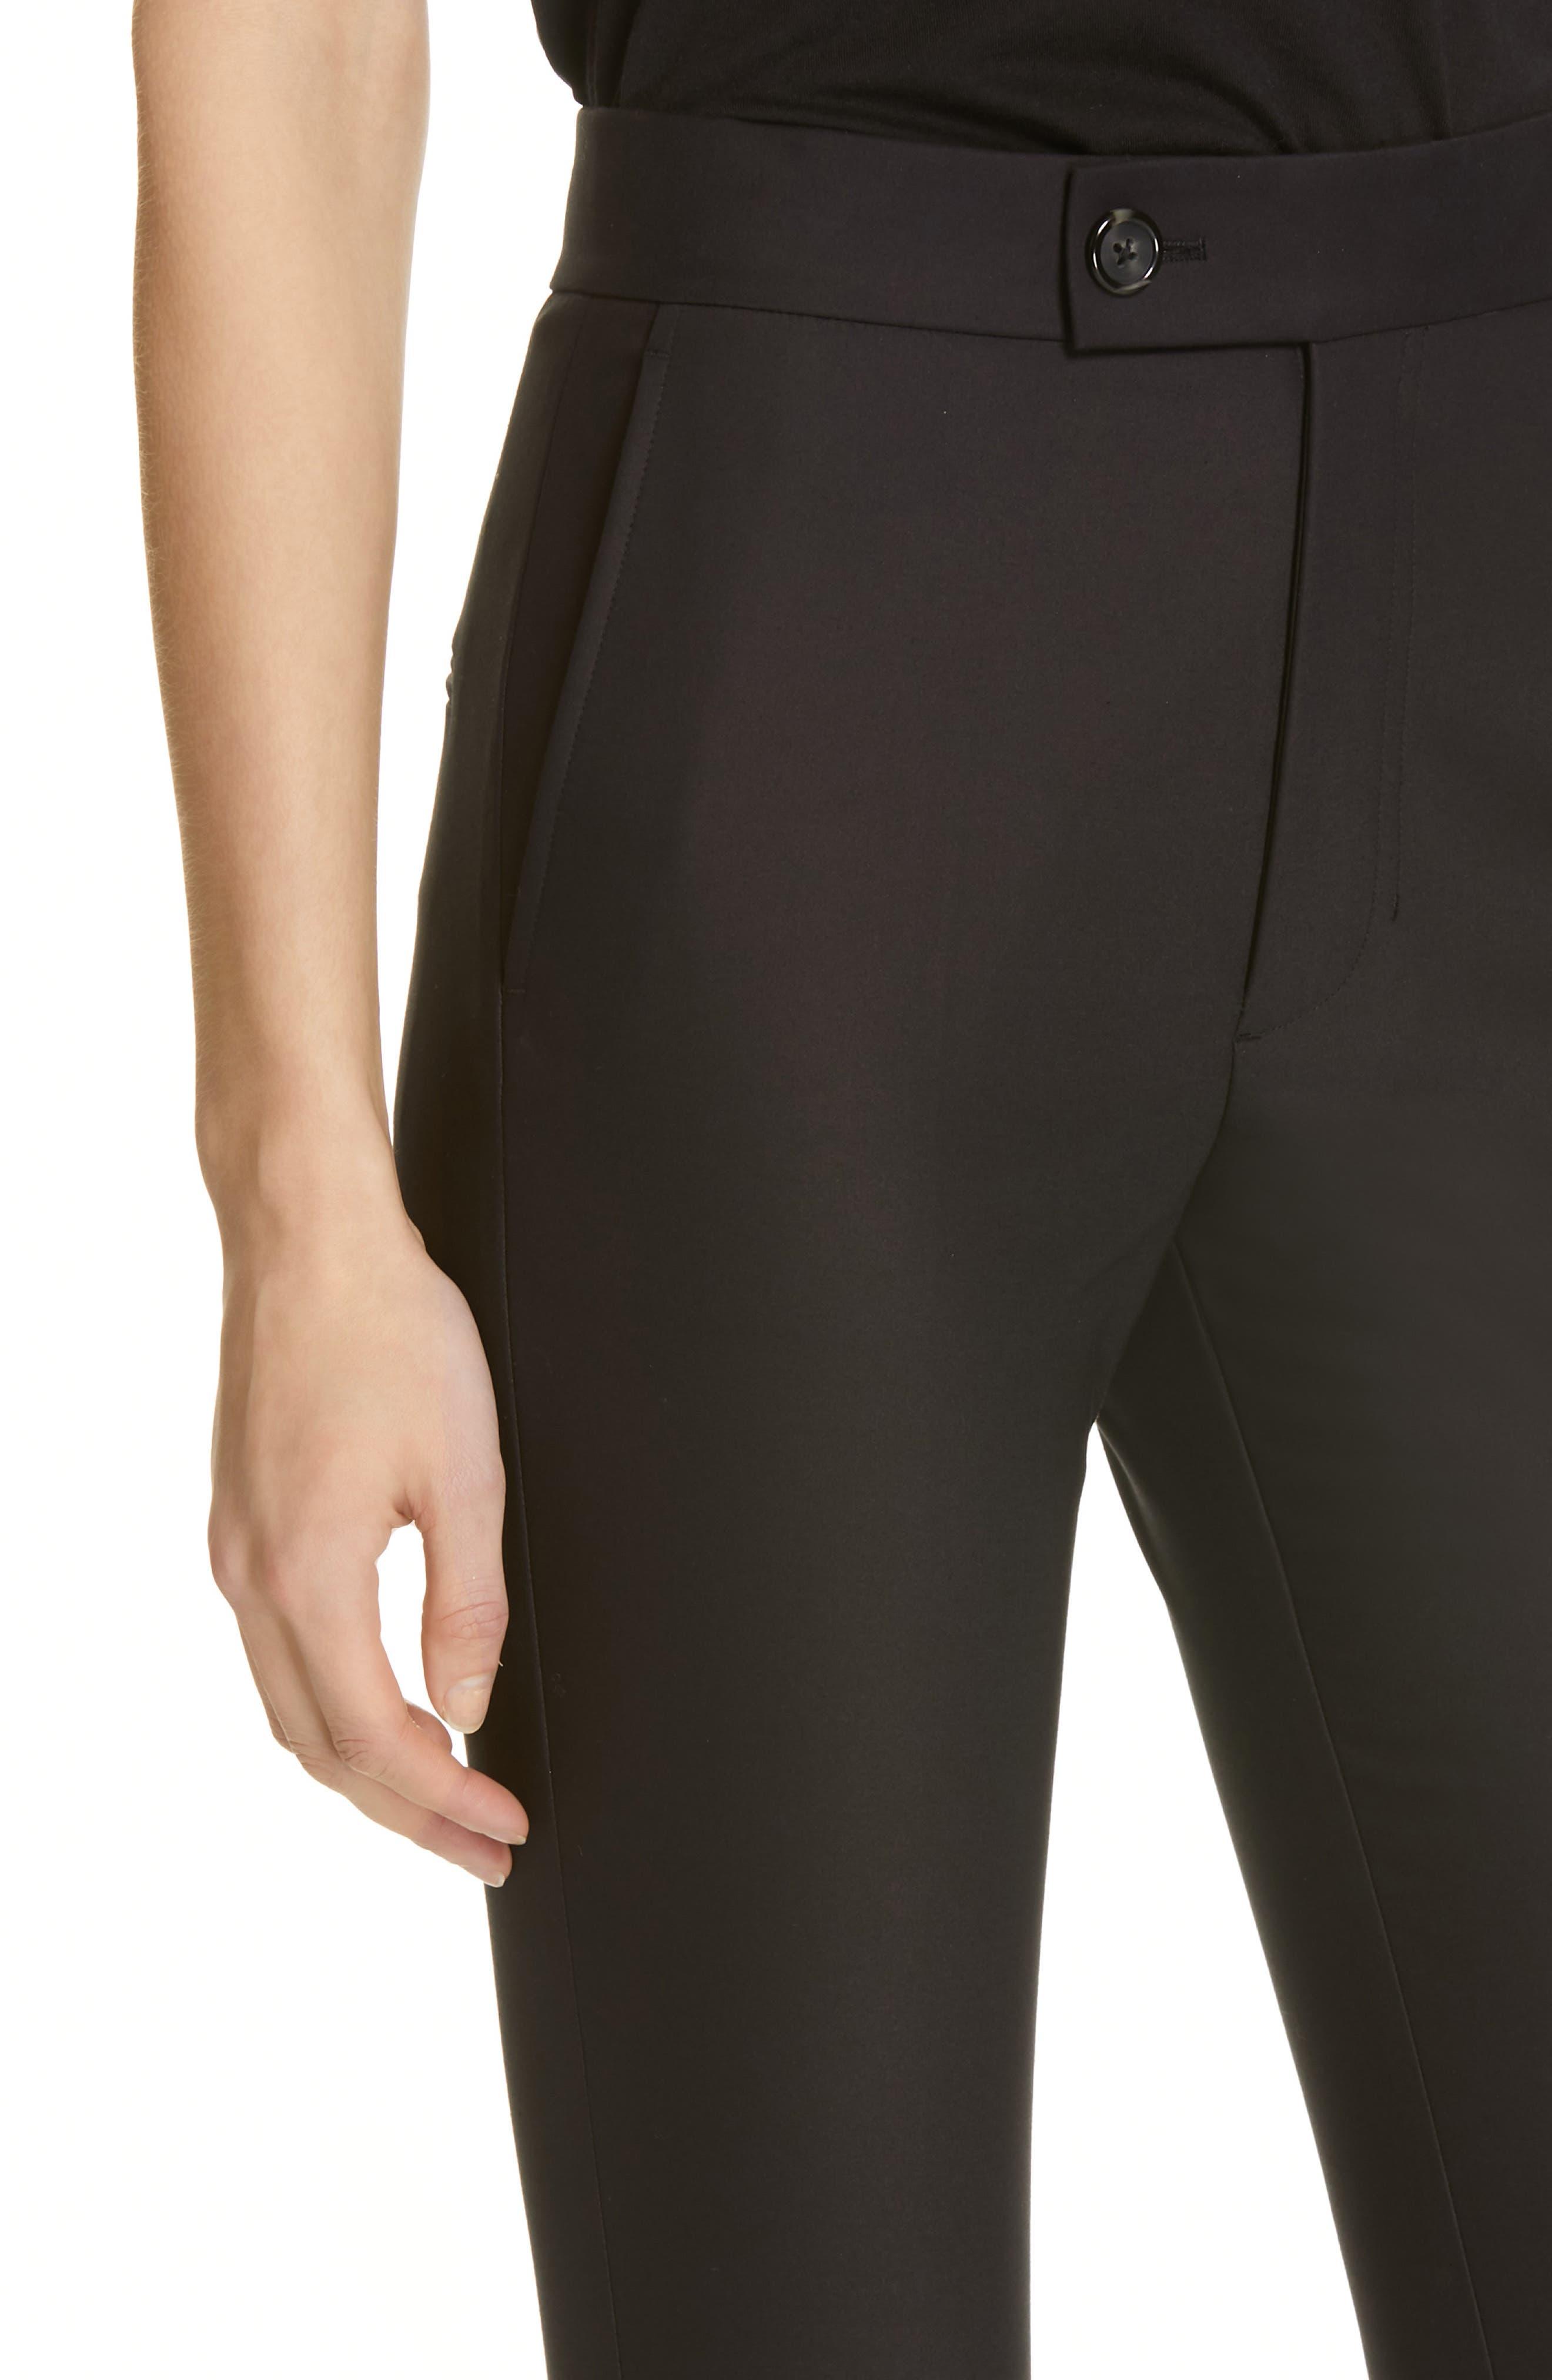 Rider Legging Pants,                             Alternate thumbnail 4, color,                             BLACK